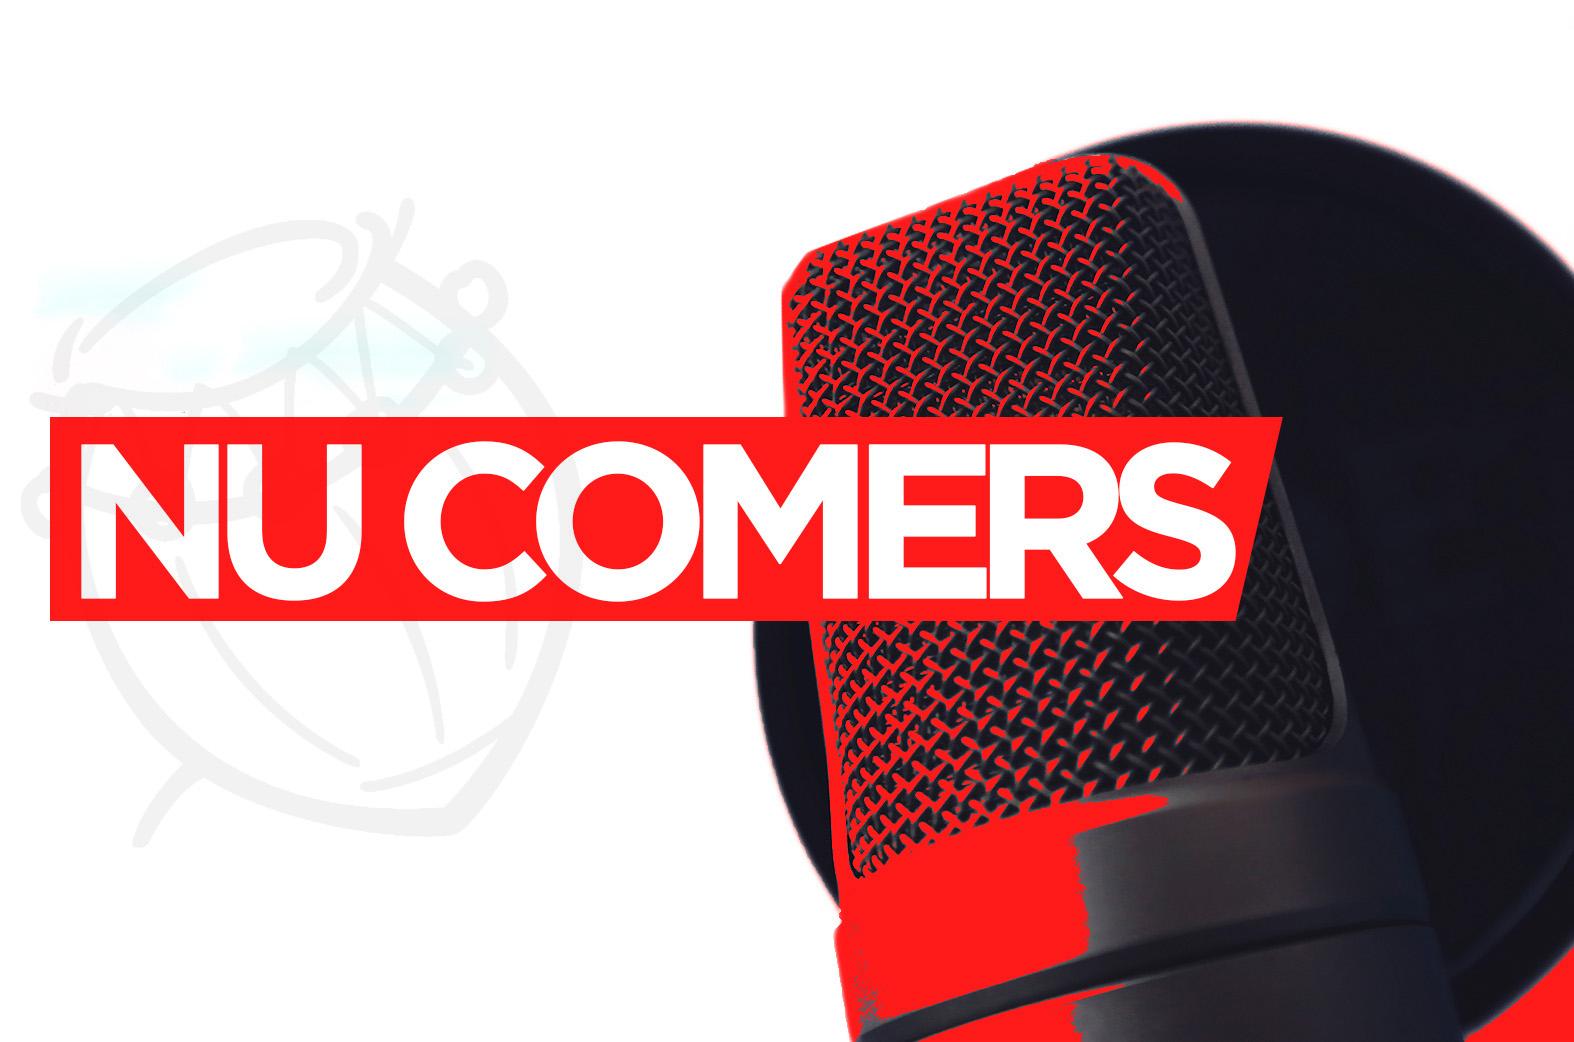 Top 2018 Ghana songs so far by NuComers